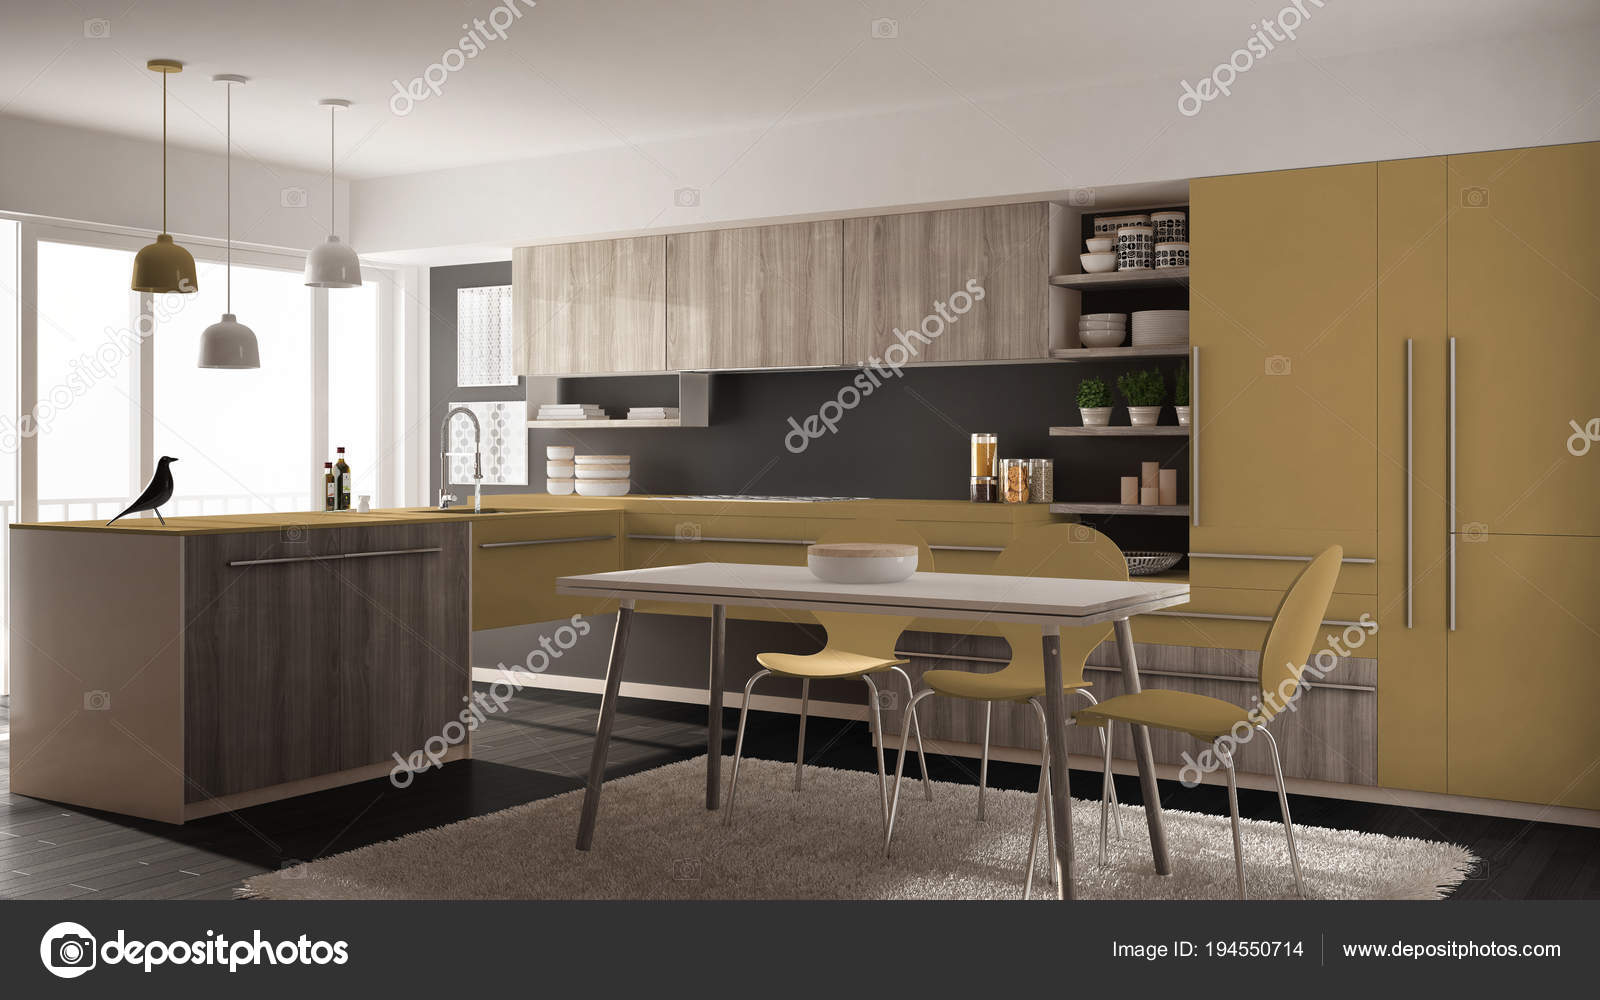 yellow kitchen rugs can we paint cabinets 现代简约木制厨房配有餐桌 地毯 全景窗 灰黄色建筑室内设计 图库照片 灰黄色